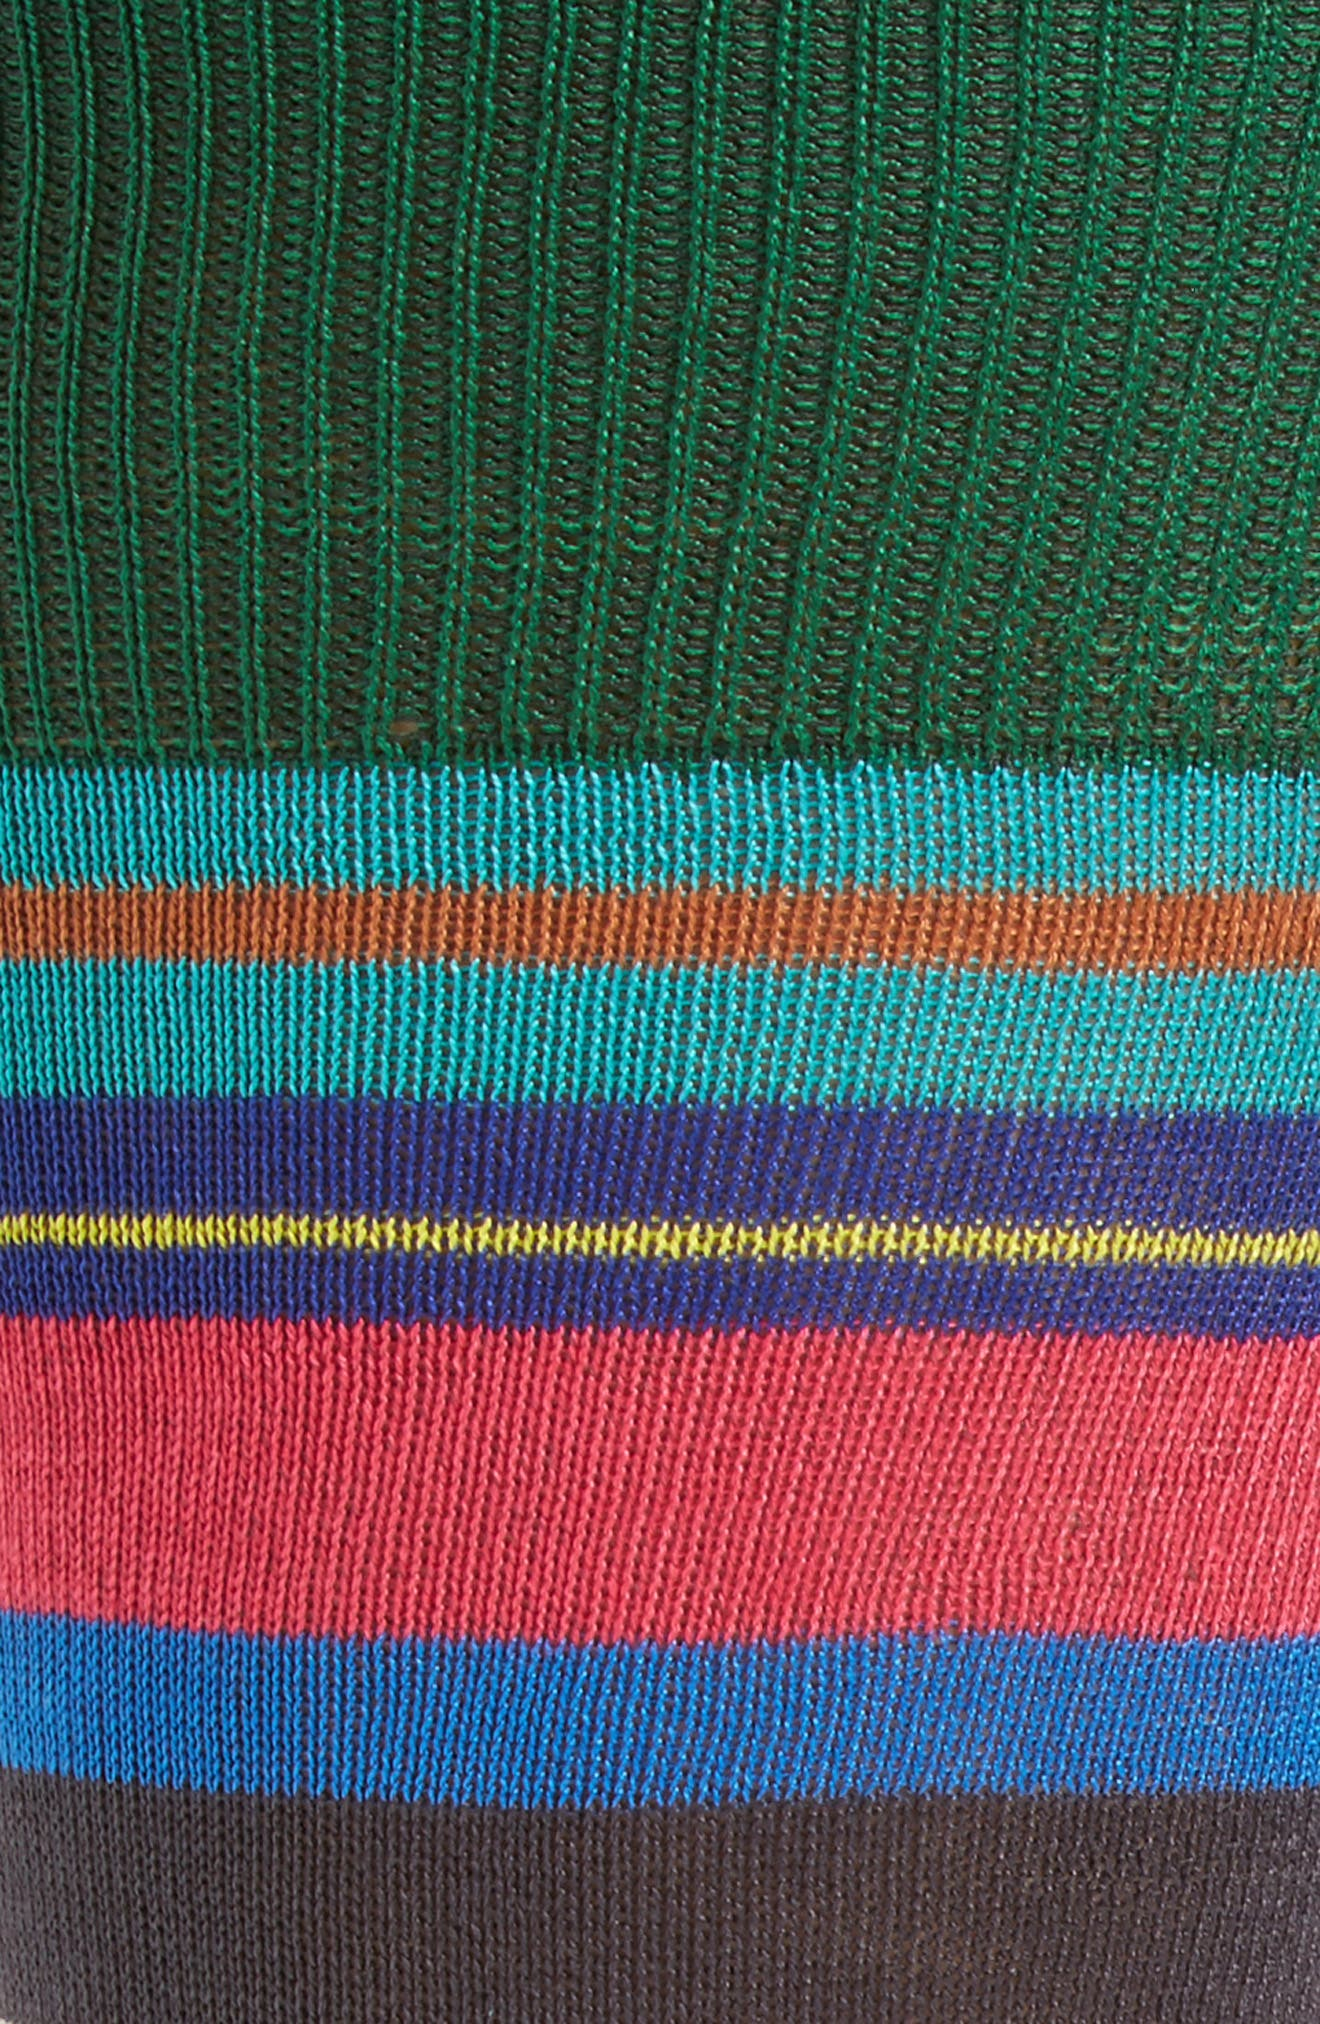 Halentoe Stripe Socks,                             Alternate thumbnail 2, color,                             001